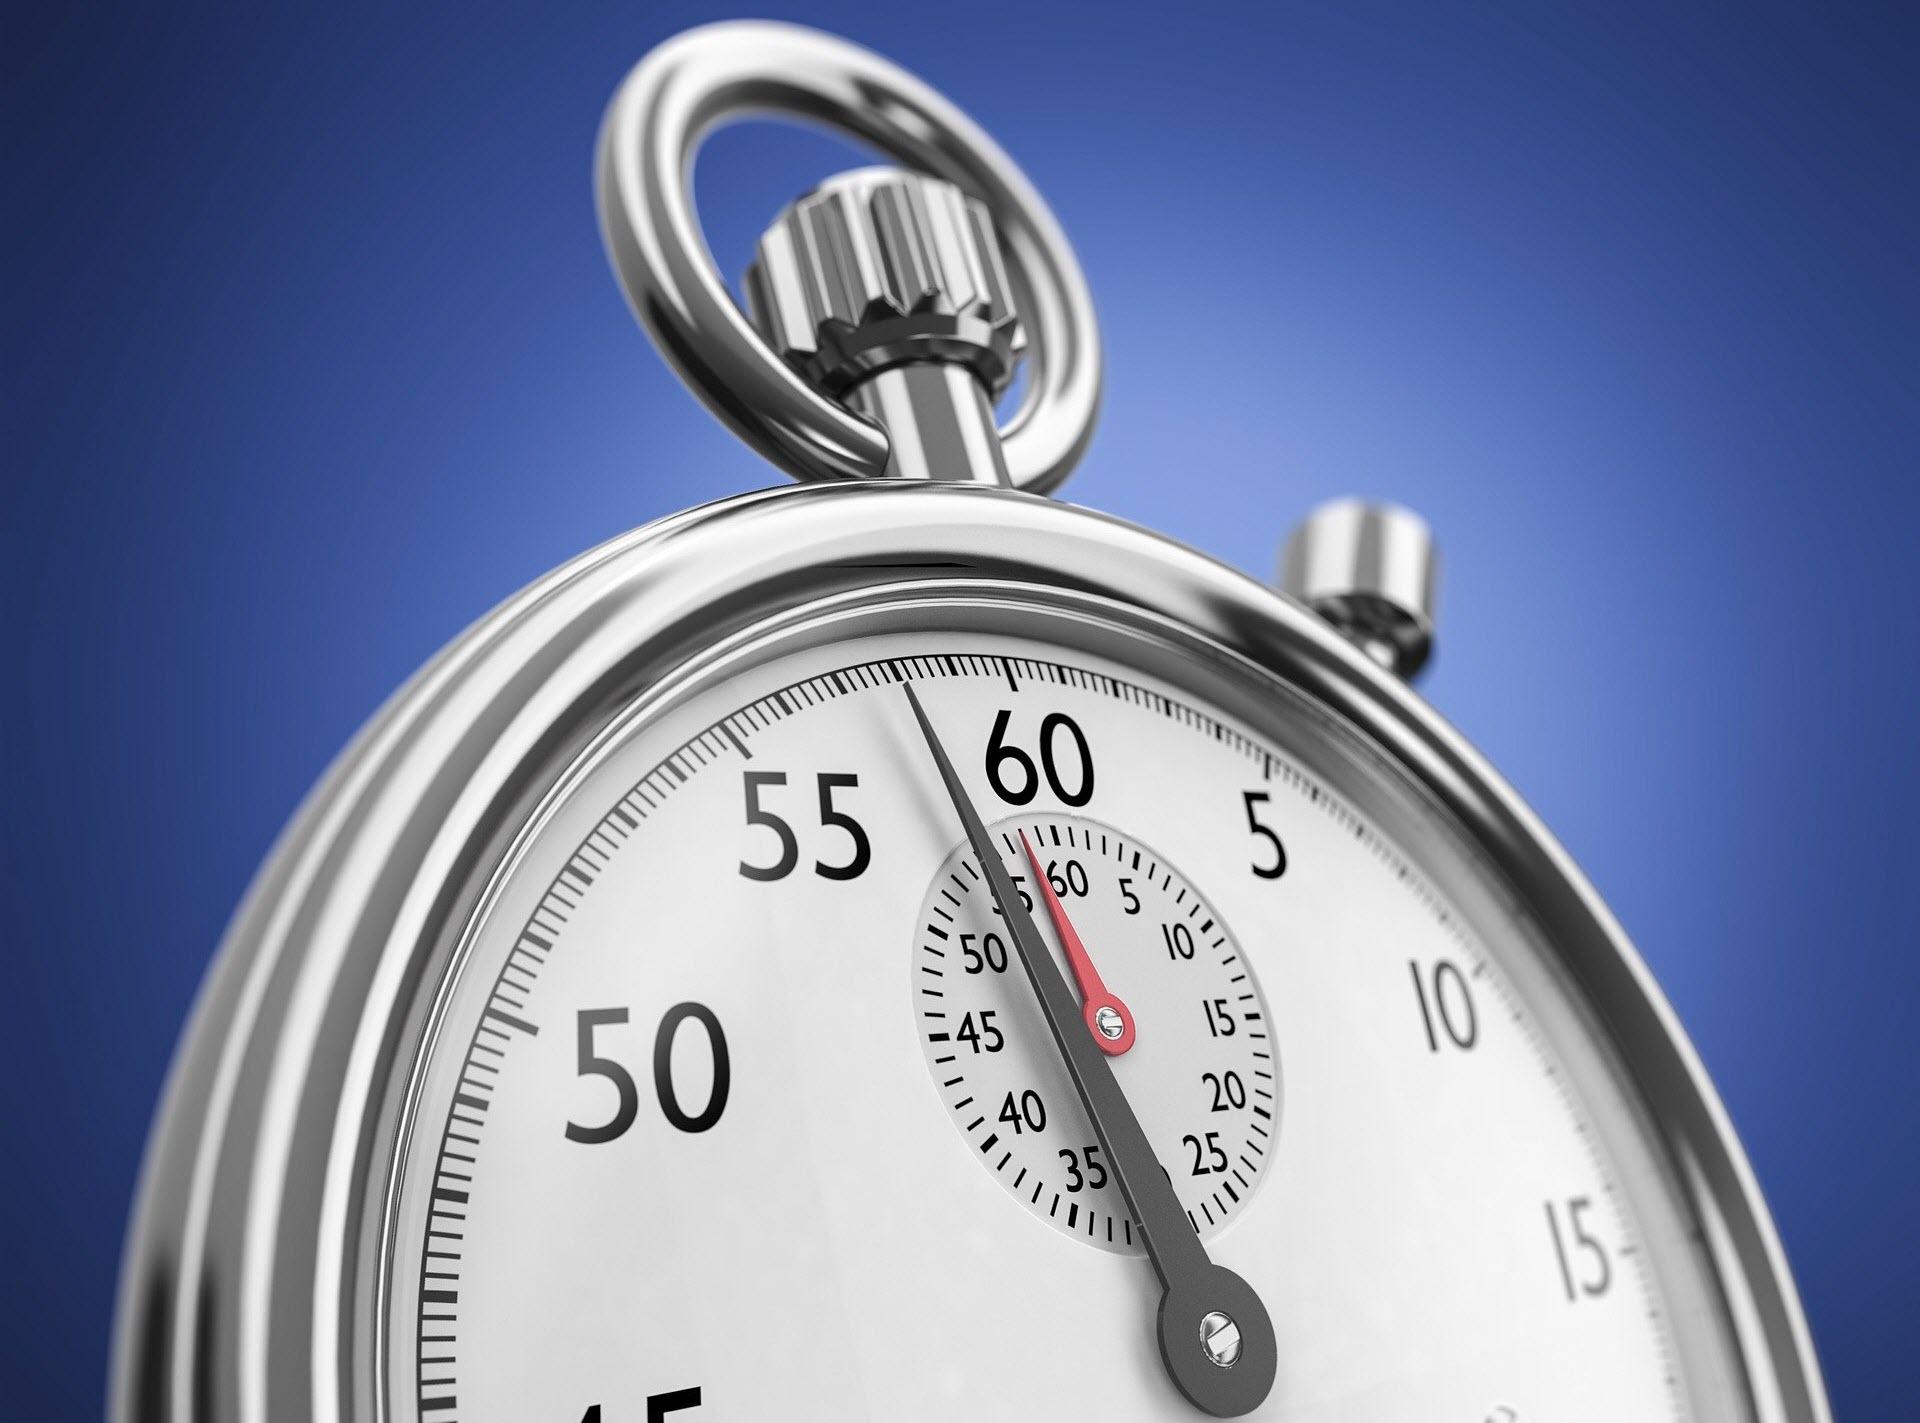 Final countdown to release ETIM 8.0